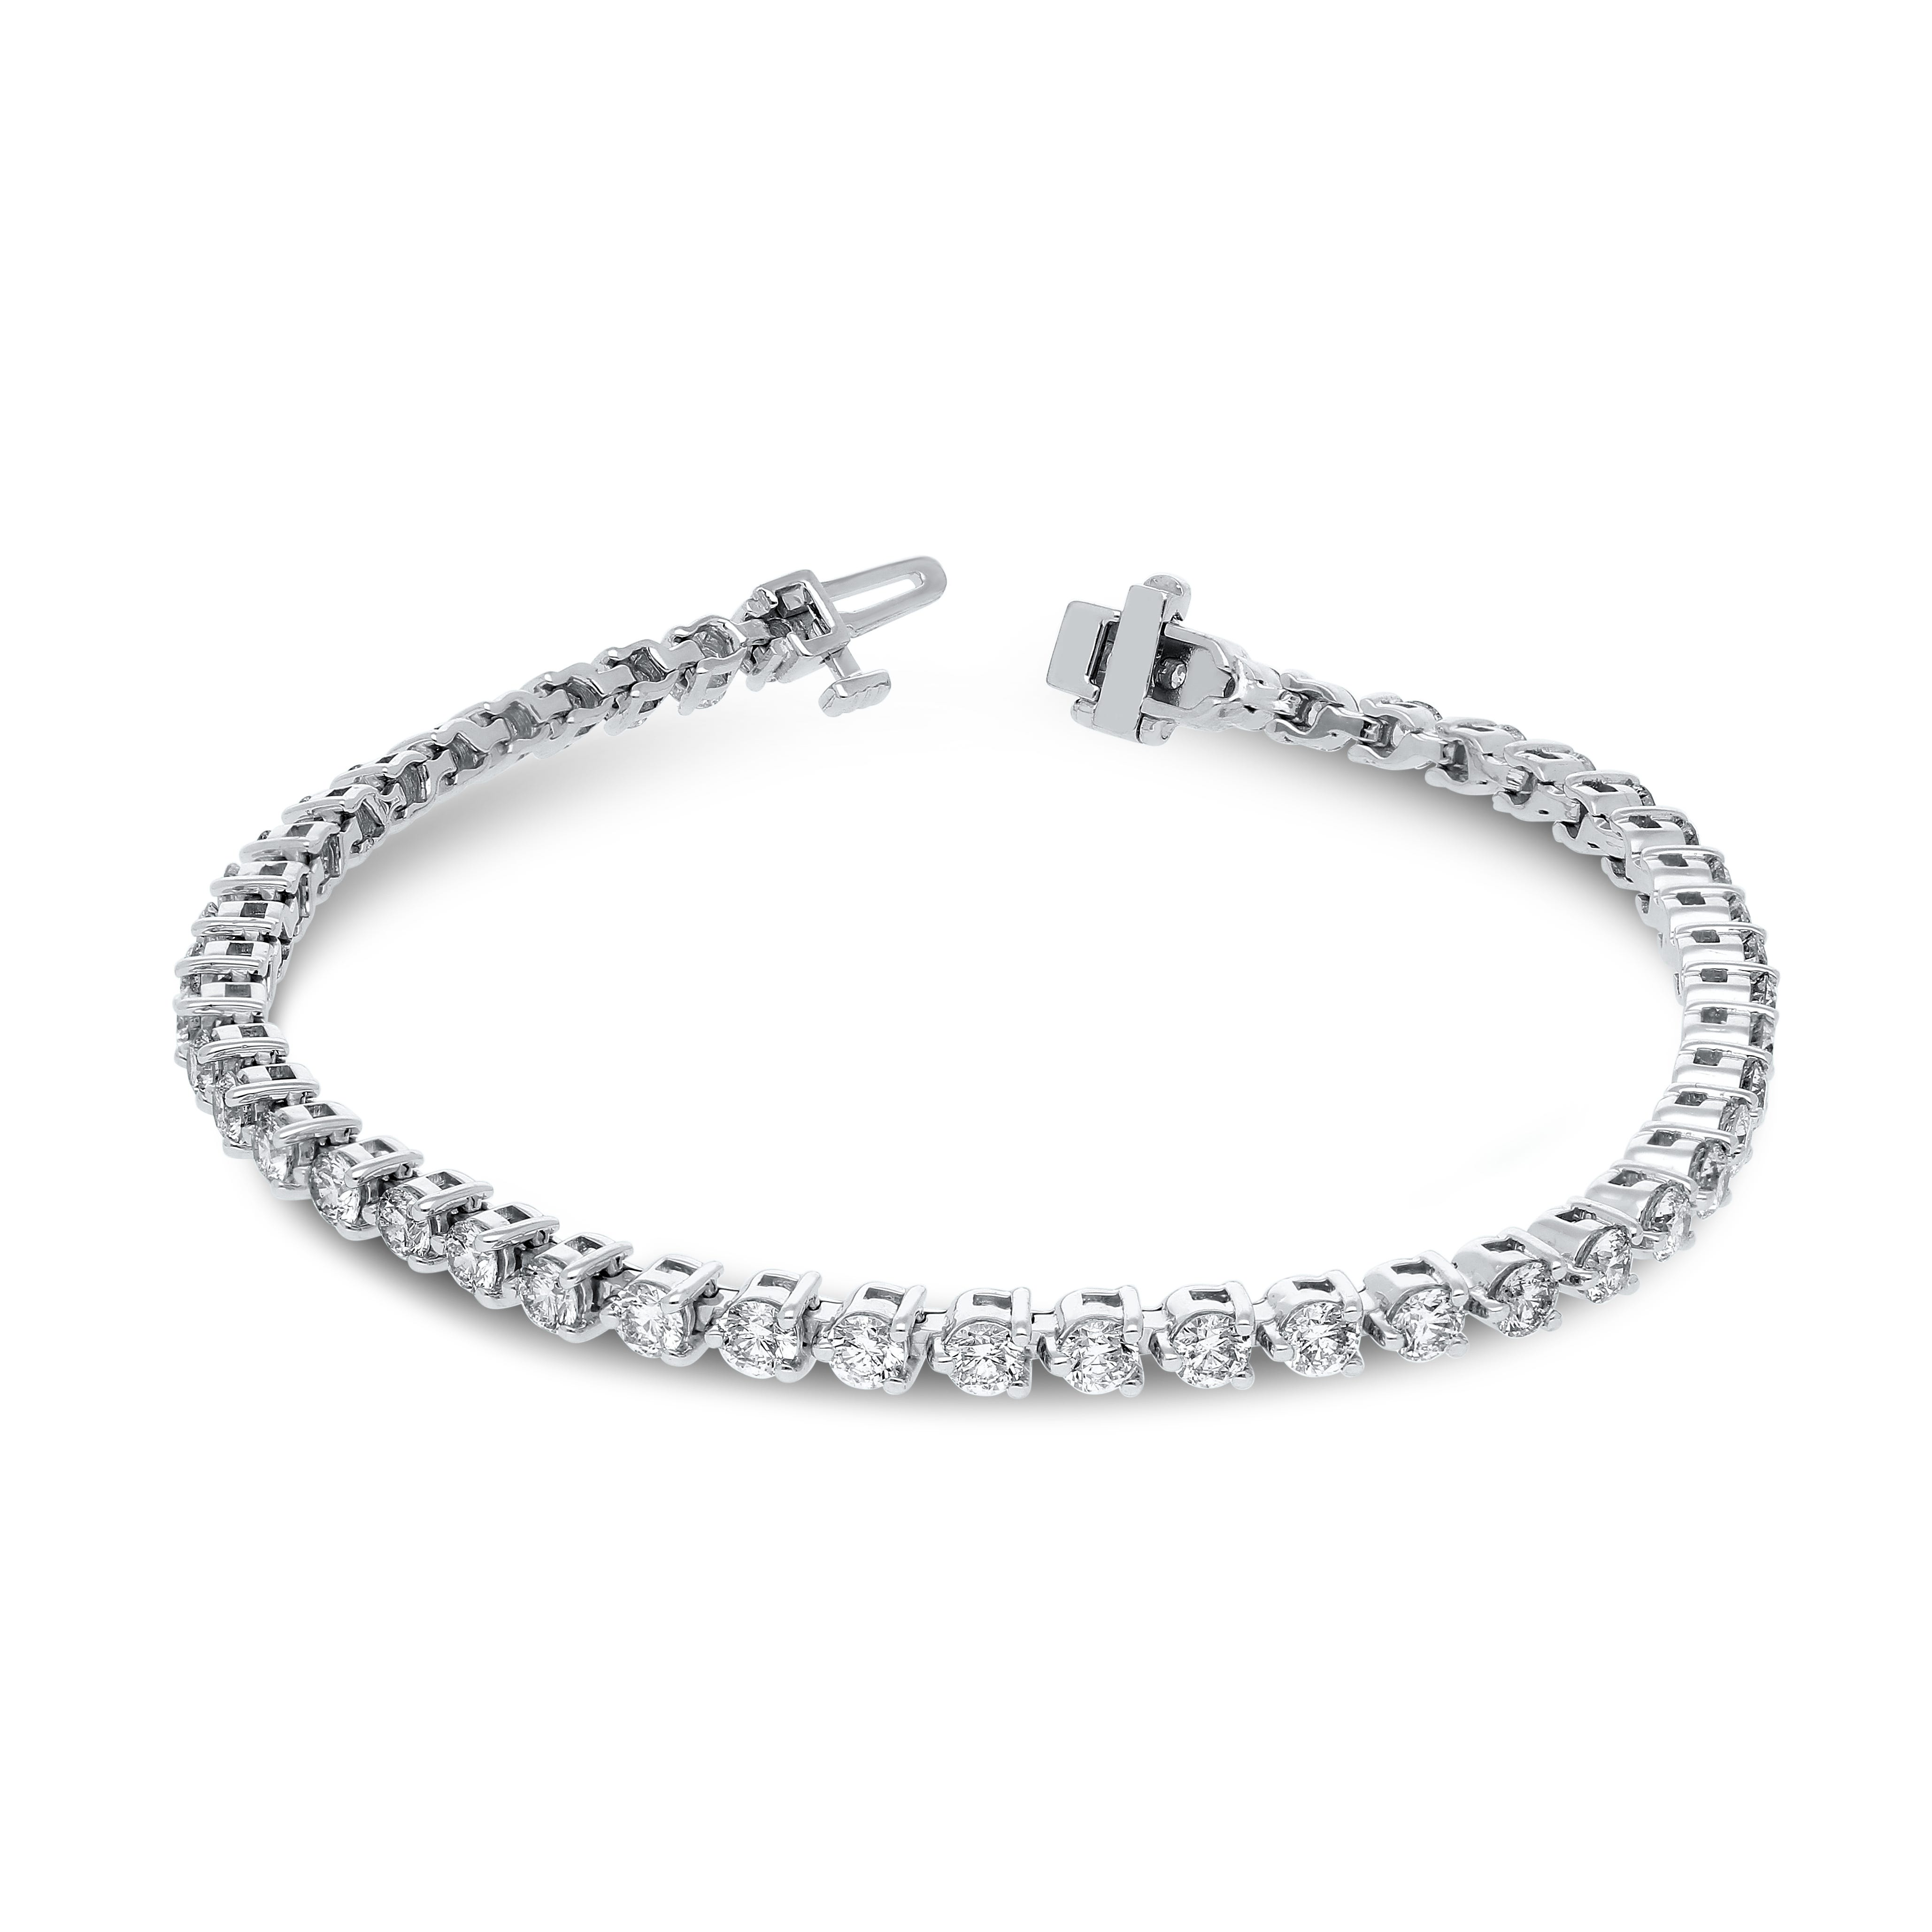 Lab Grown 4ct. Diamond 3-Prong Tennis Bracelet in 14k White Gold